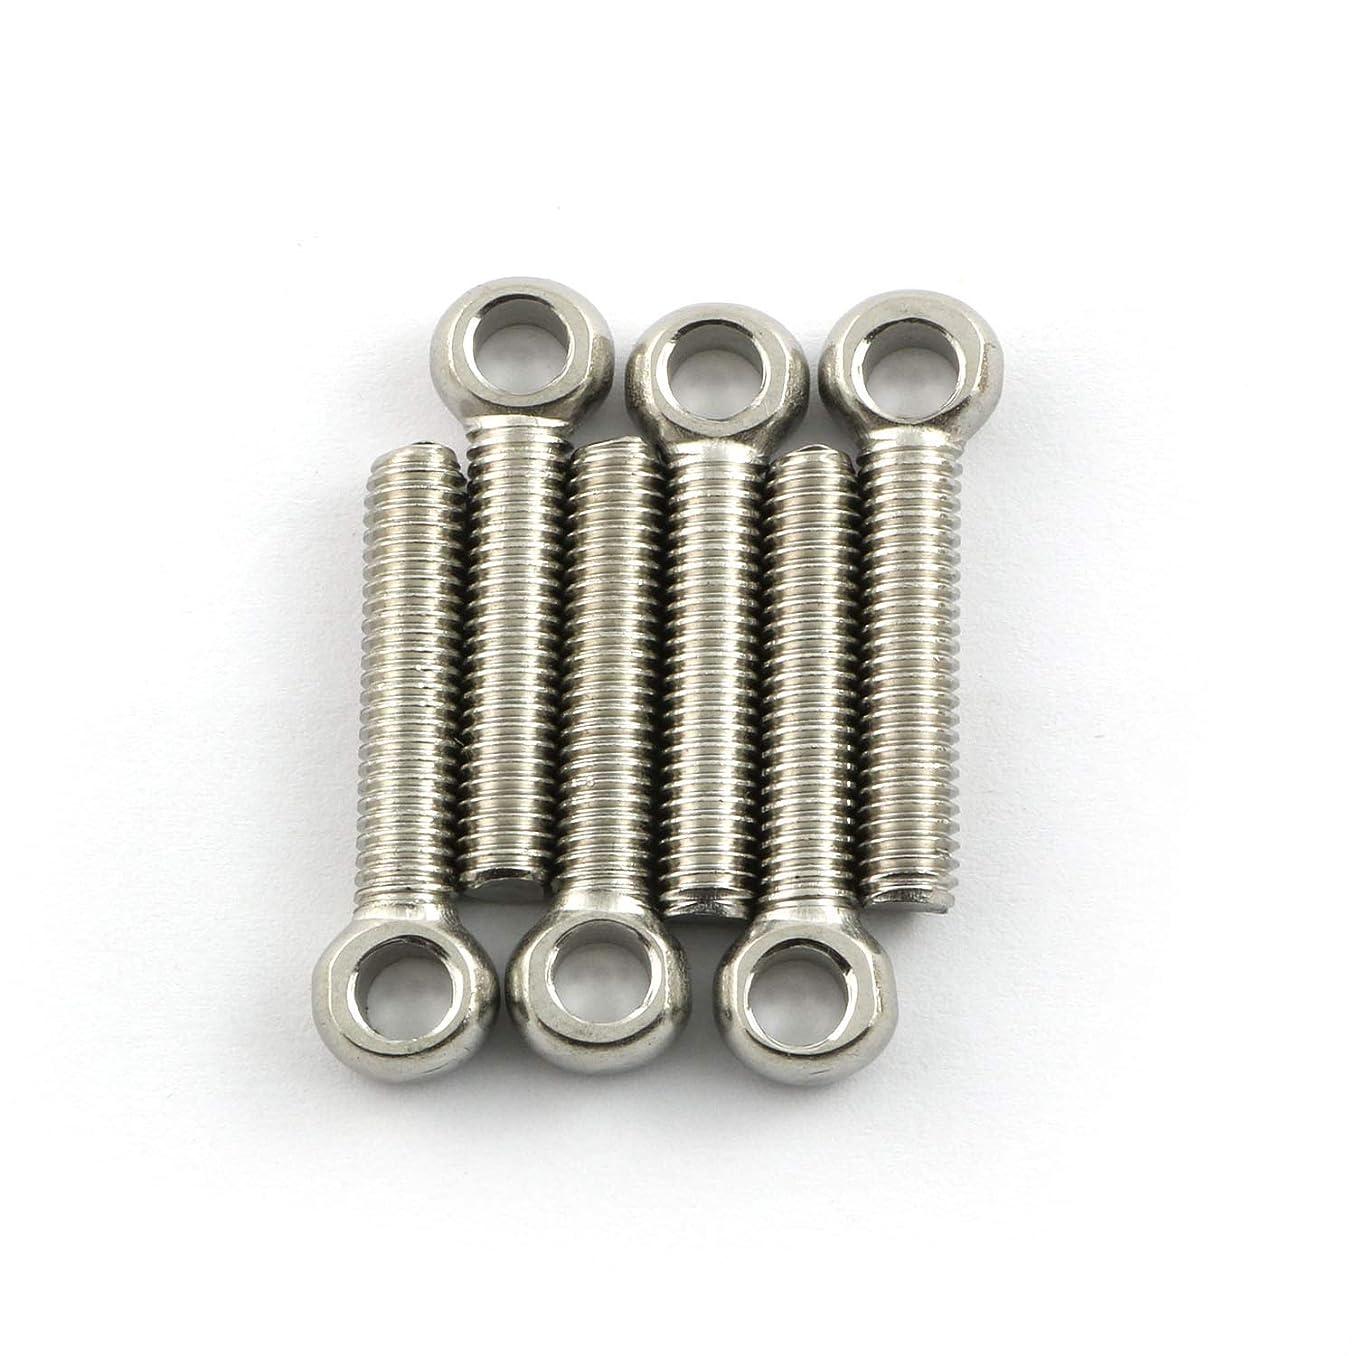 6pcs M6x30mm Eye Bolt Screw Lifting Ring Eye Bolts 304 Stainless Steel Axle Pin Split Pin Shaft Pin Dowel Bolt Ring Screw Loop Hole Bolt